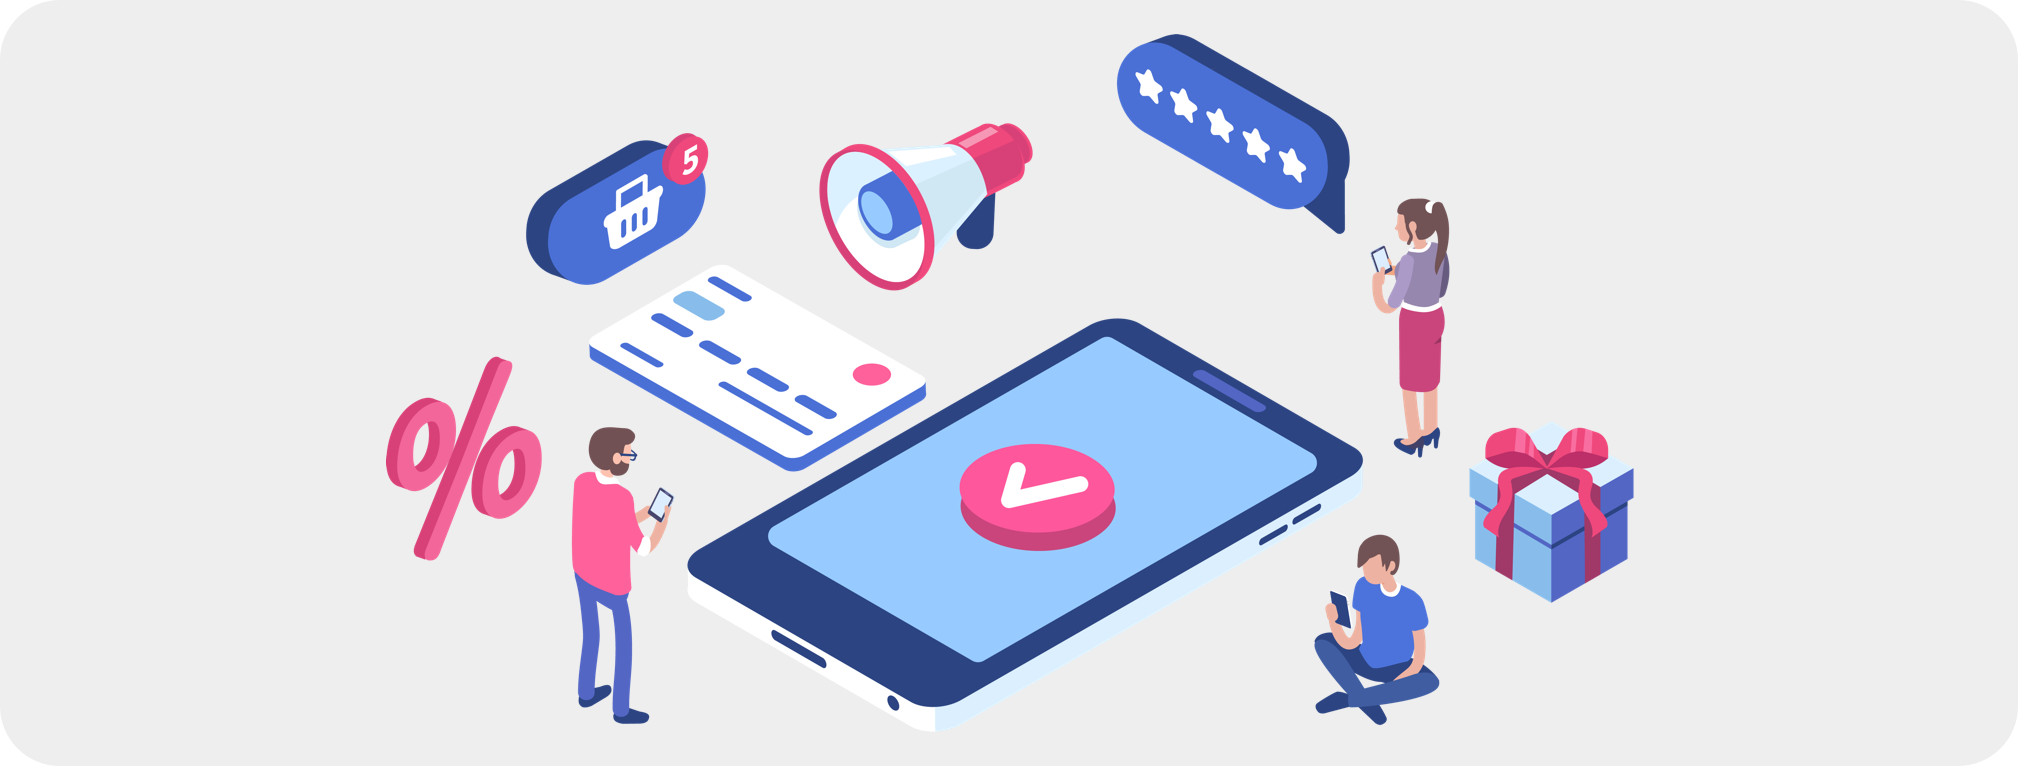 Get the best offline survey app, SurveySparrow for an uninterrupted data collection experience.